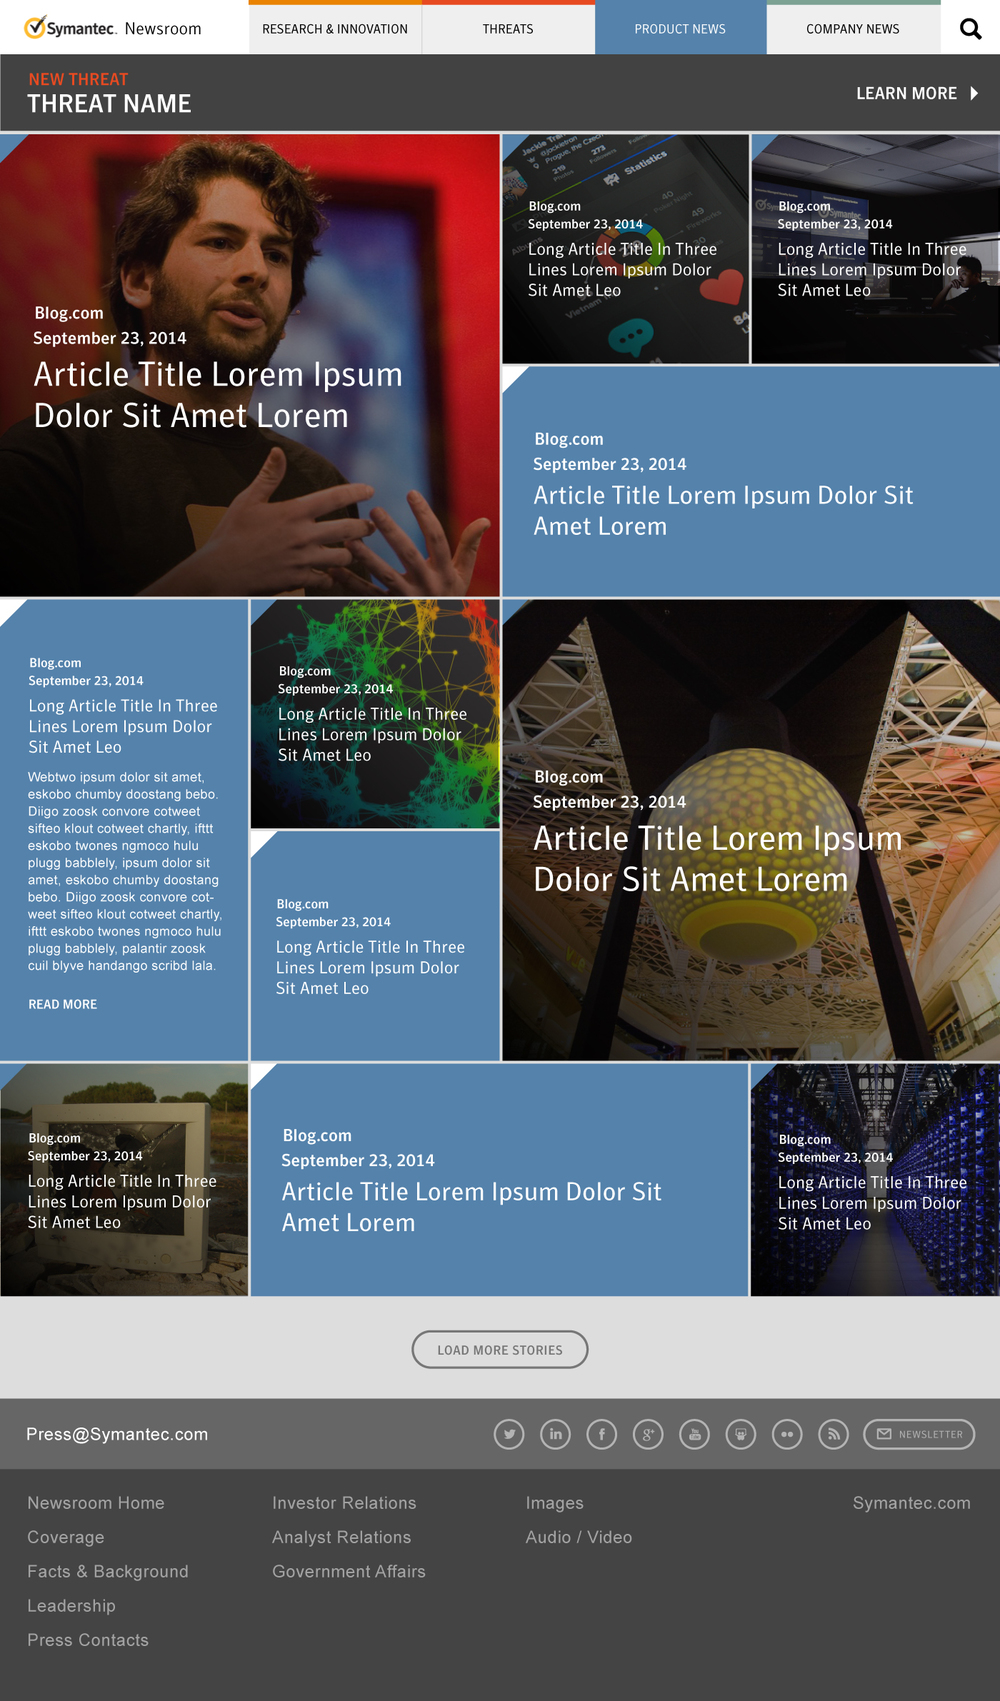 Symantec_Newsroom_04_01c.jpg